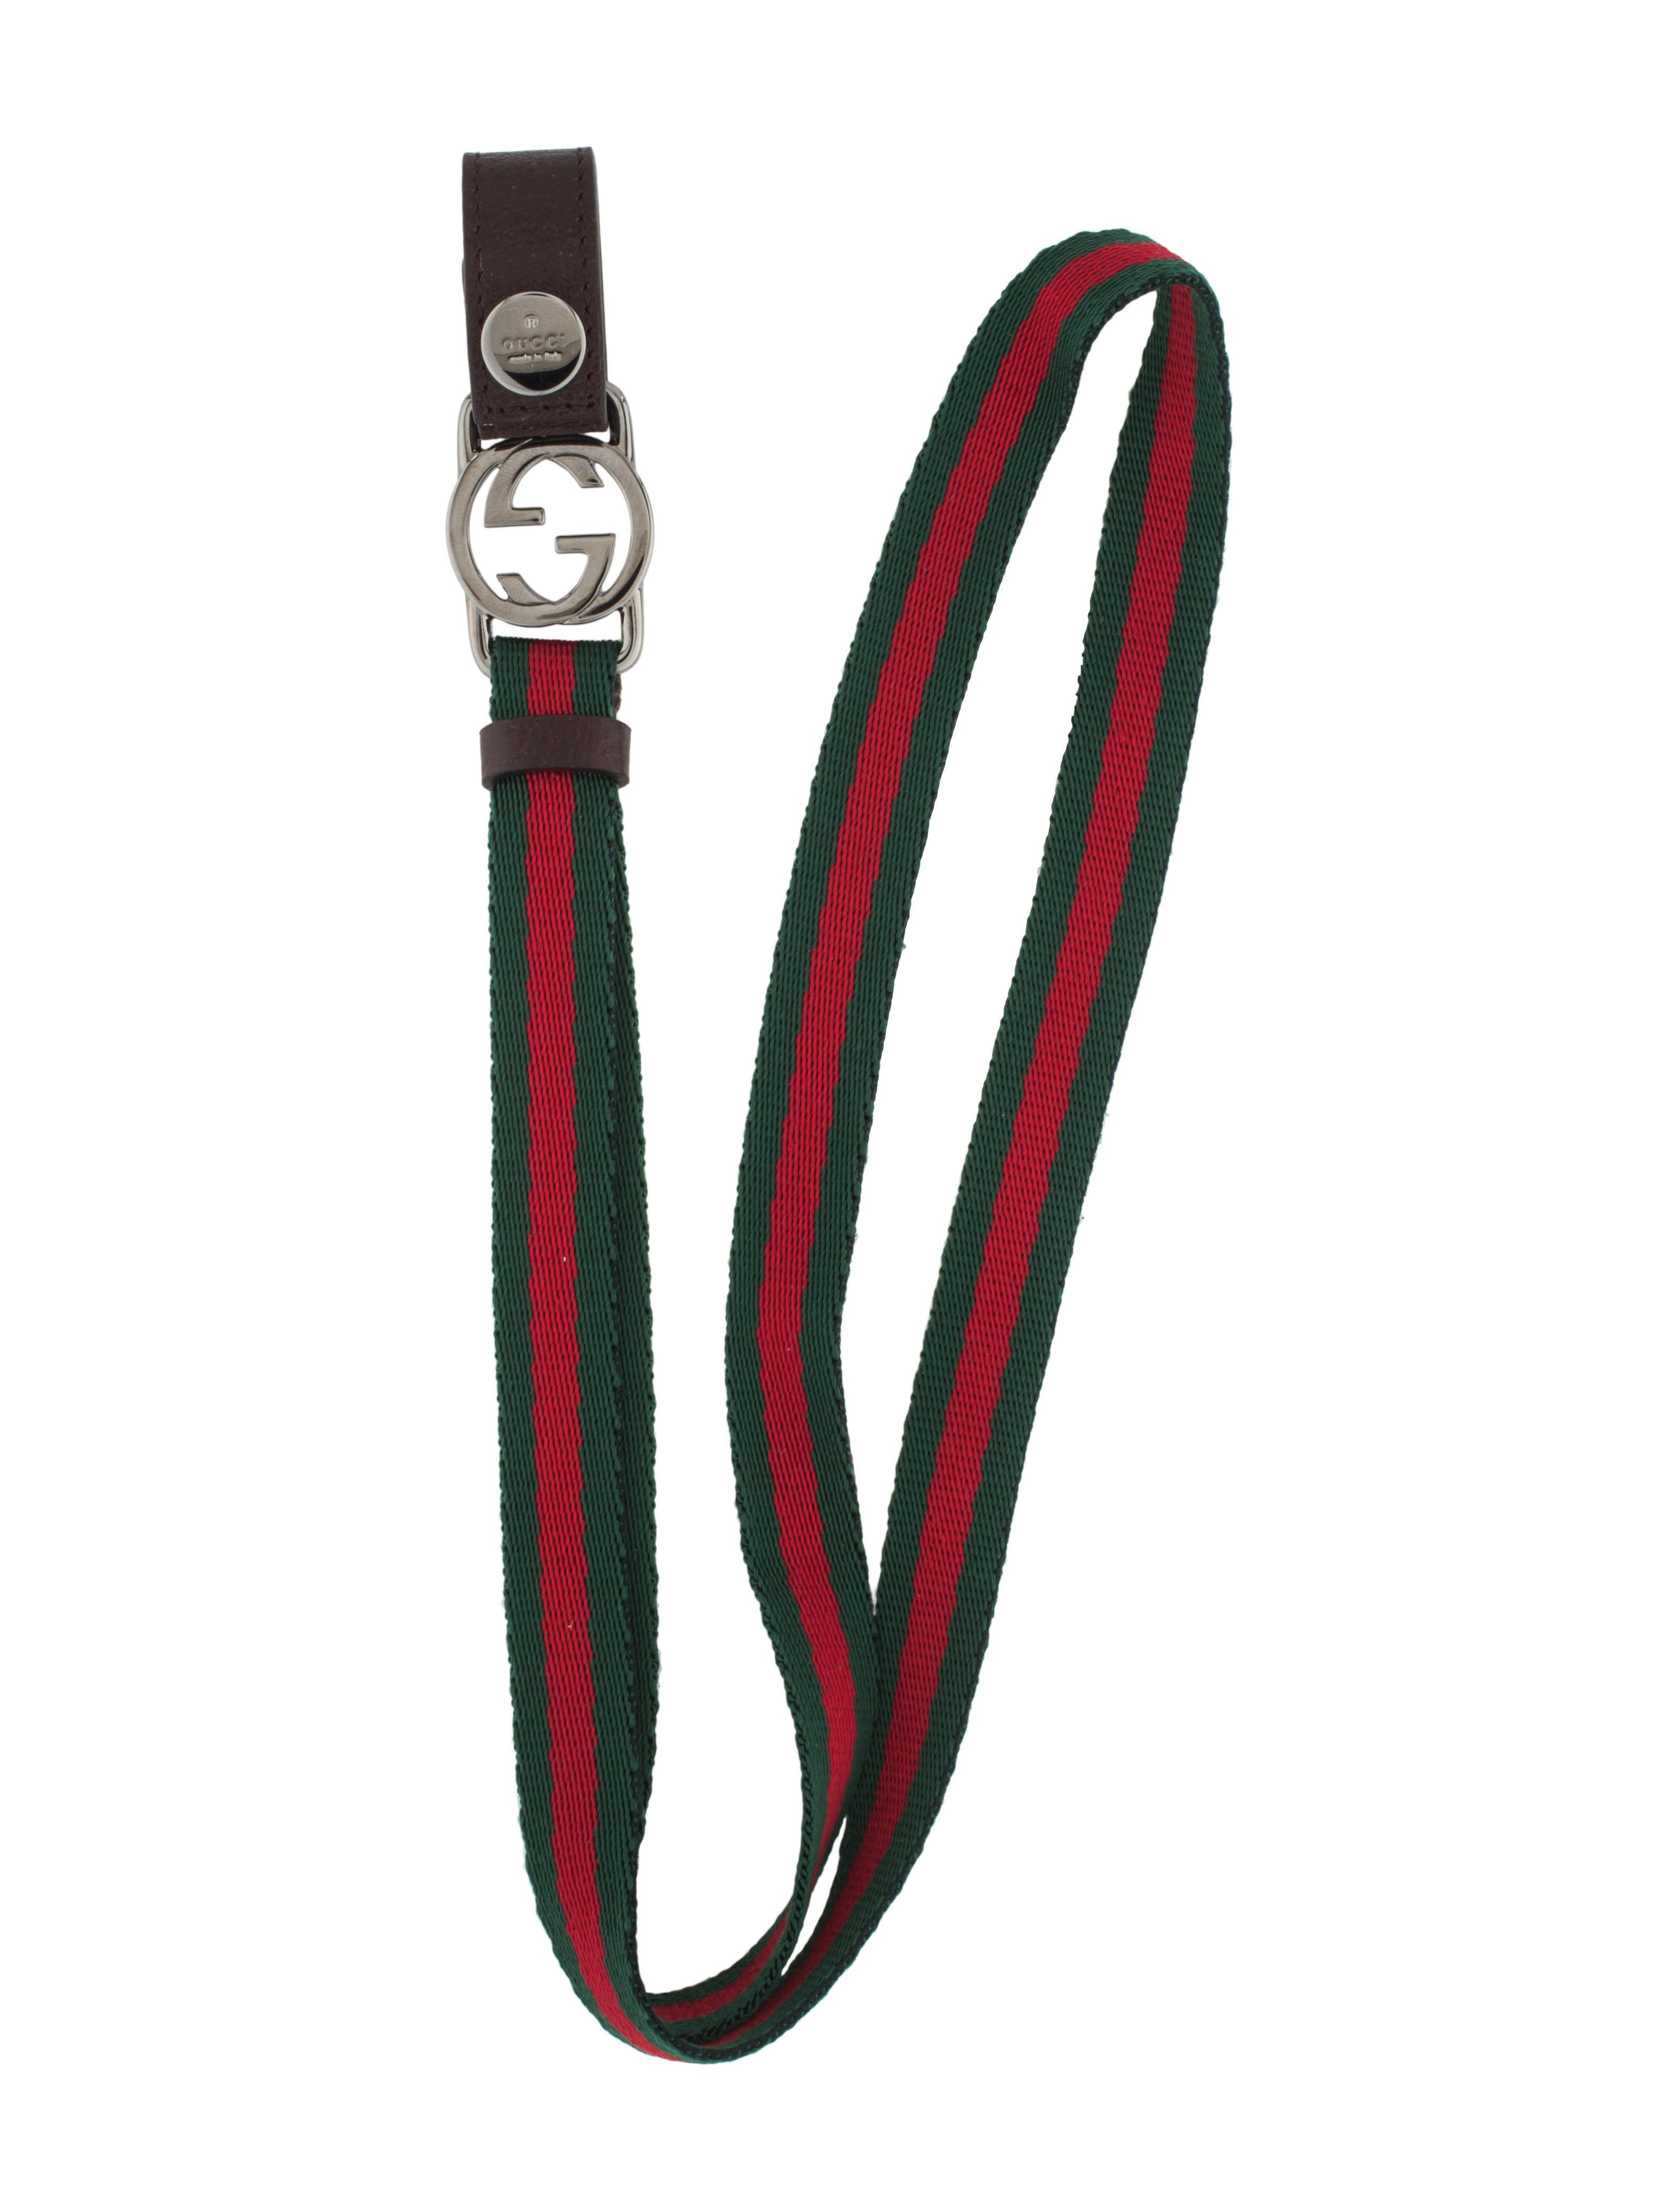 Gucci Gg Web Lanyard Key Chain Accessories Guc94469 The Realreal